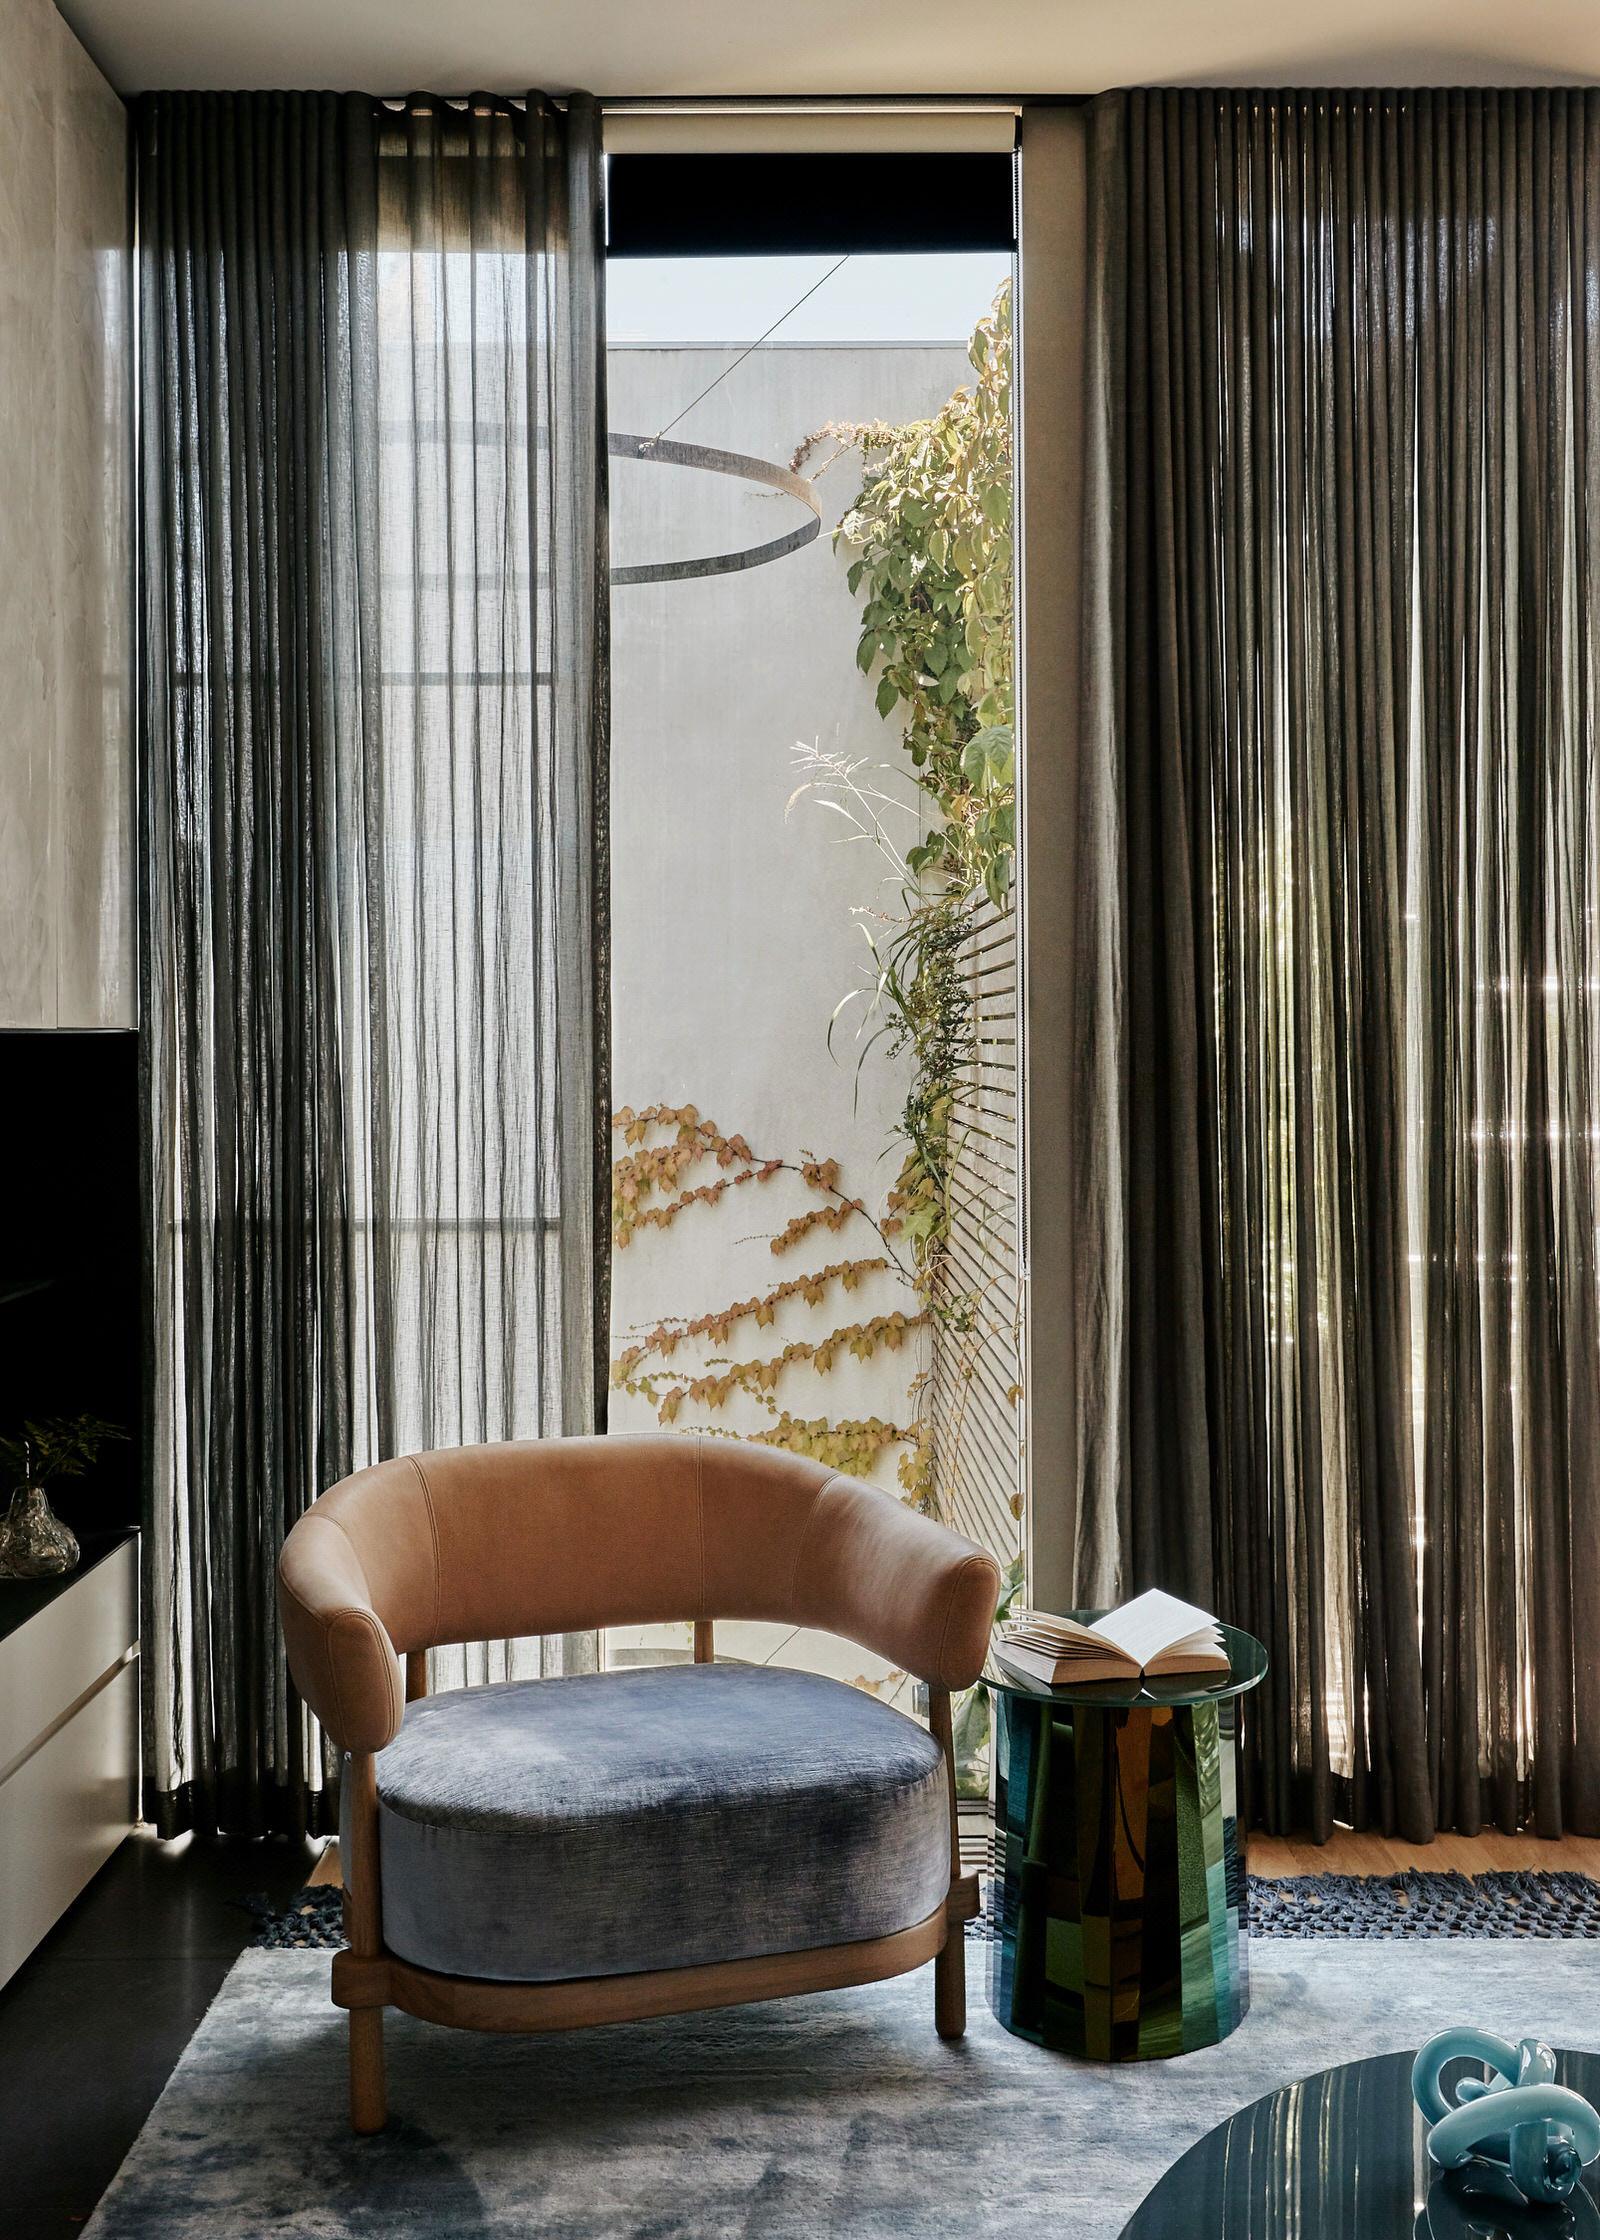 Fiona Lynch Burnley House Australian Interior Design Photo Amelia Stanwix Yellowtrace 08